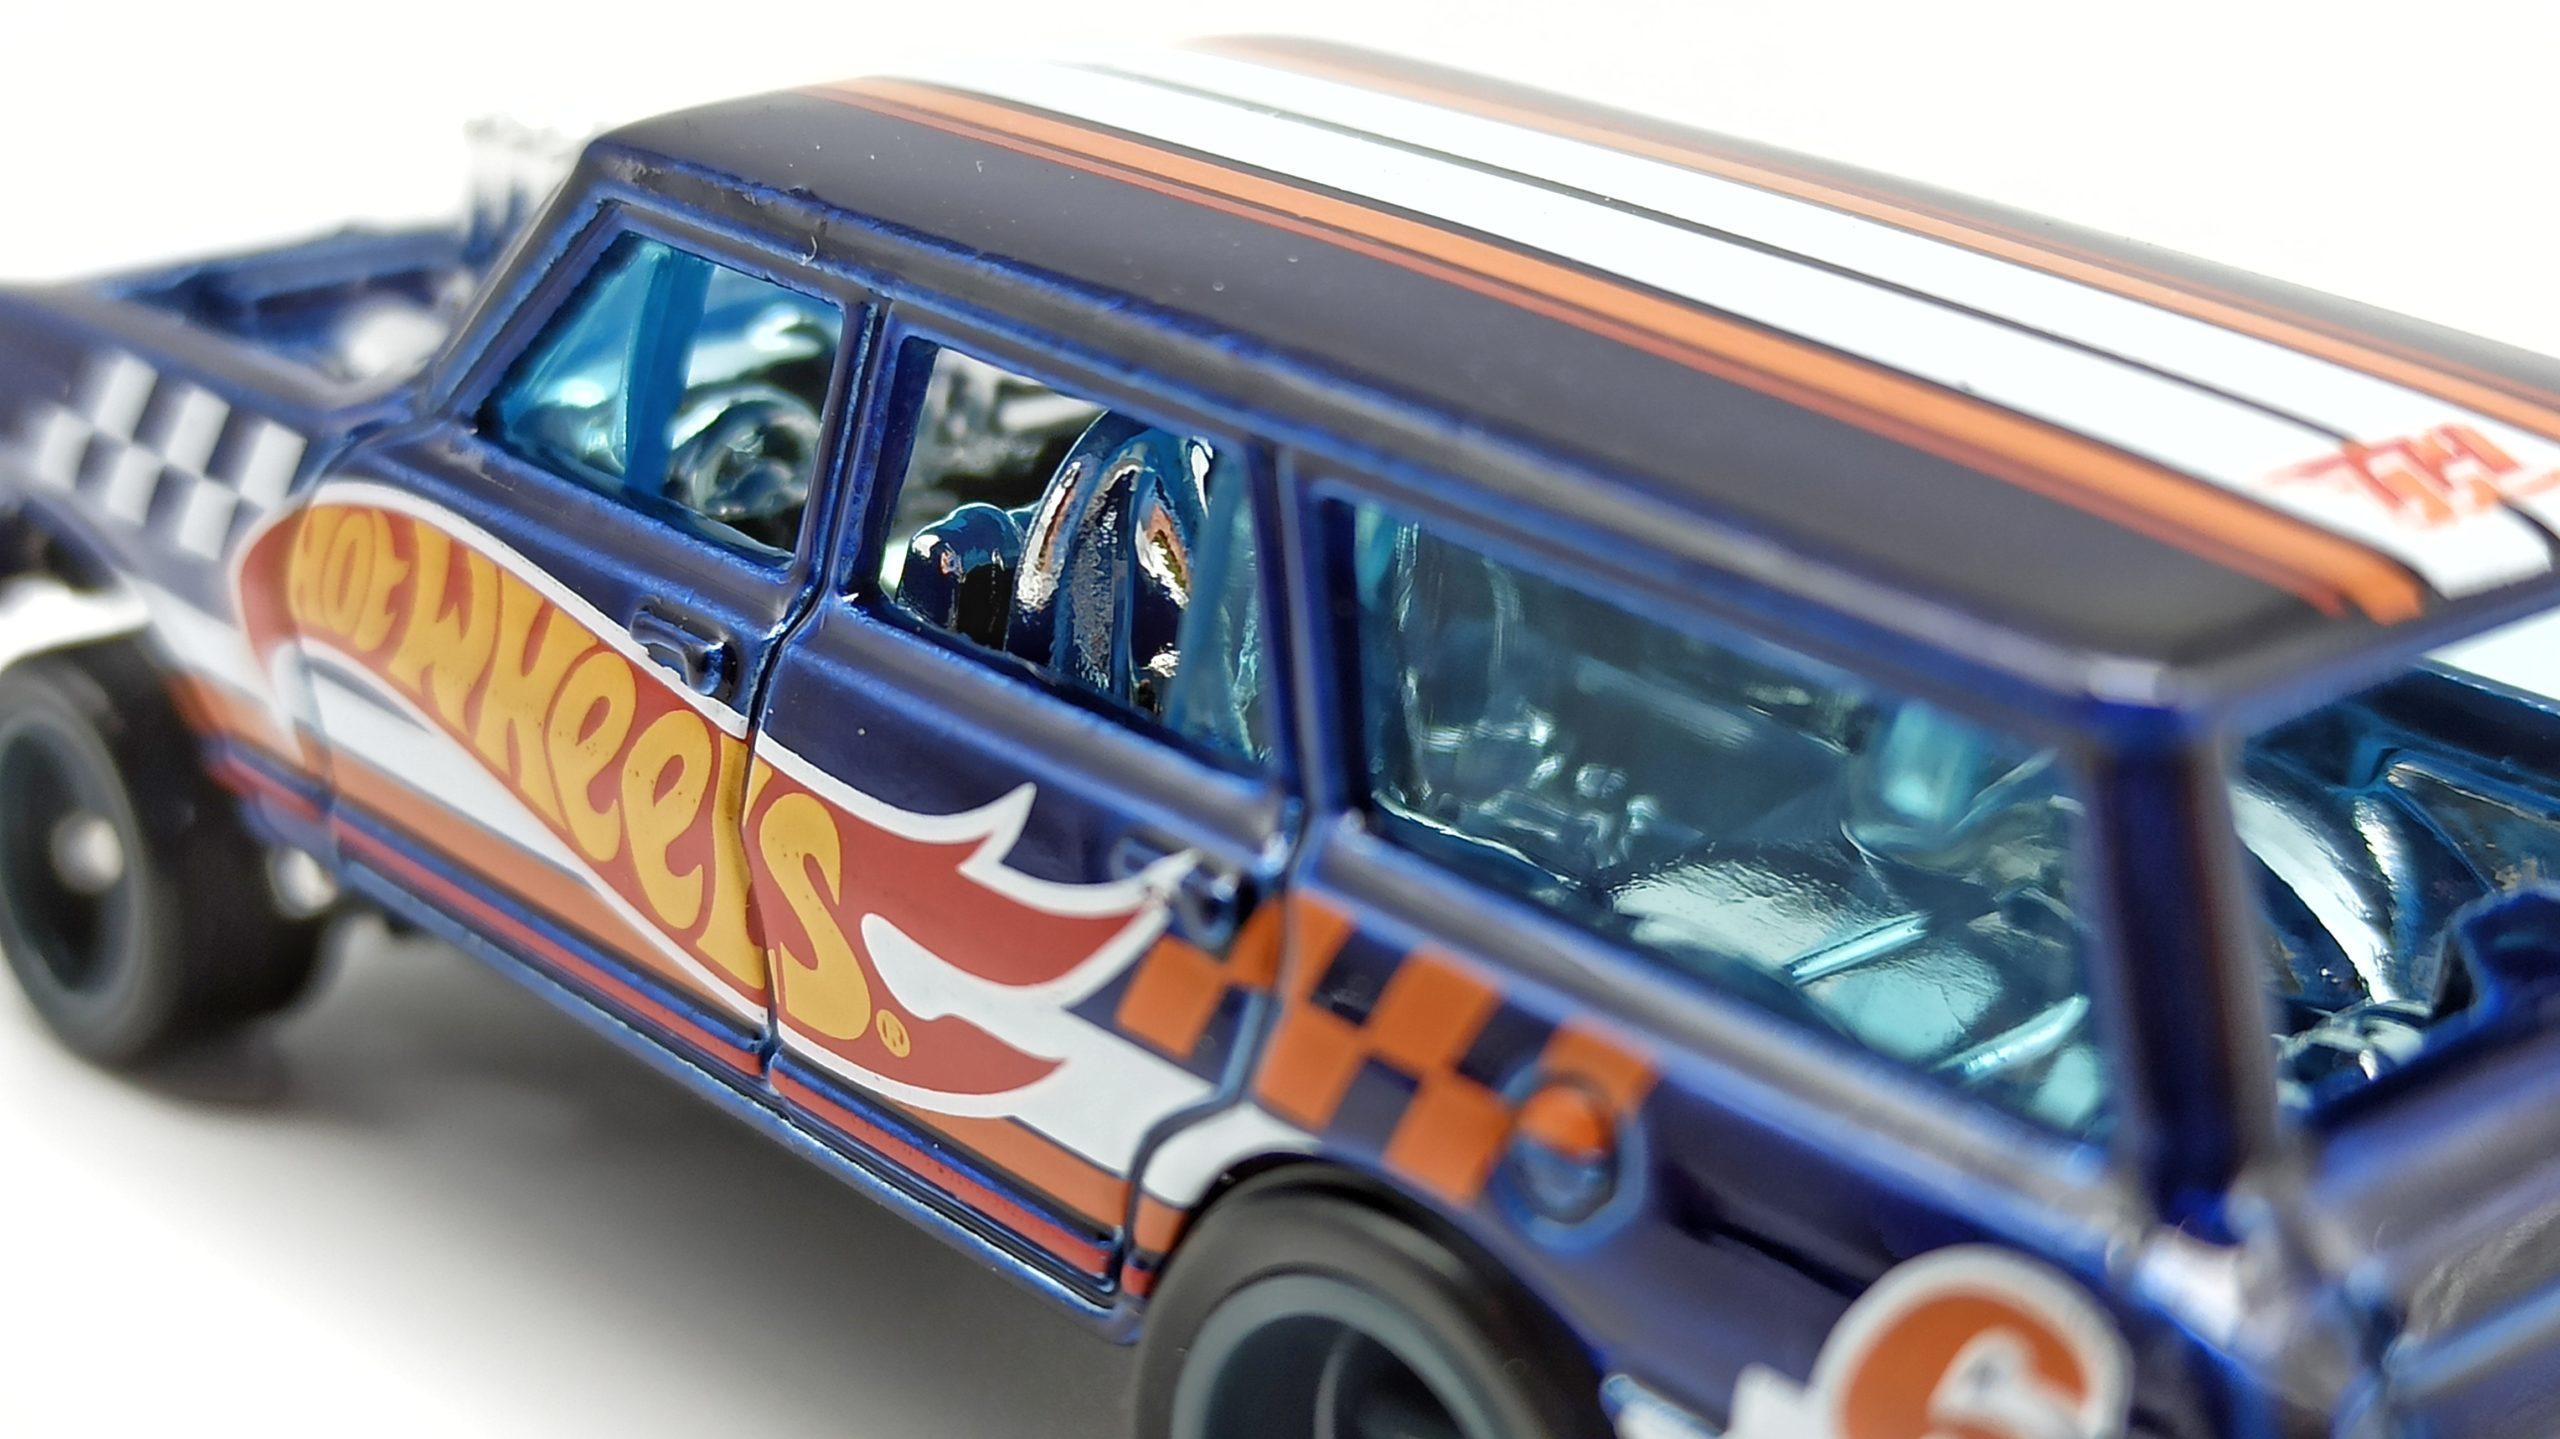 Hot Wheels '64 Chevy Nova Wagon Gasser (GTD06) 2021 (232/250) HW Race Team (7/10) spectraflame blue Super Treasure Hunt (STH) interior